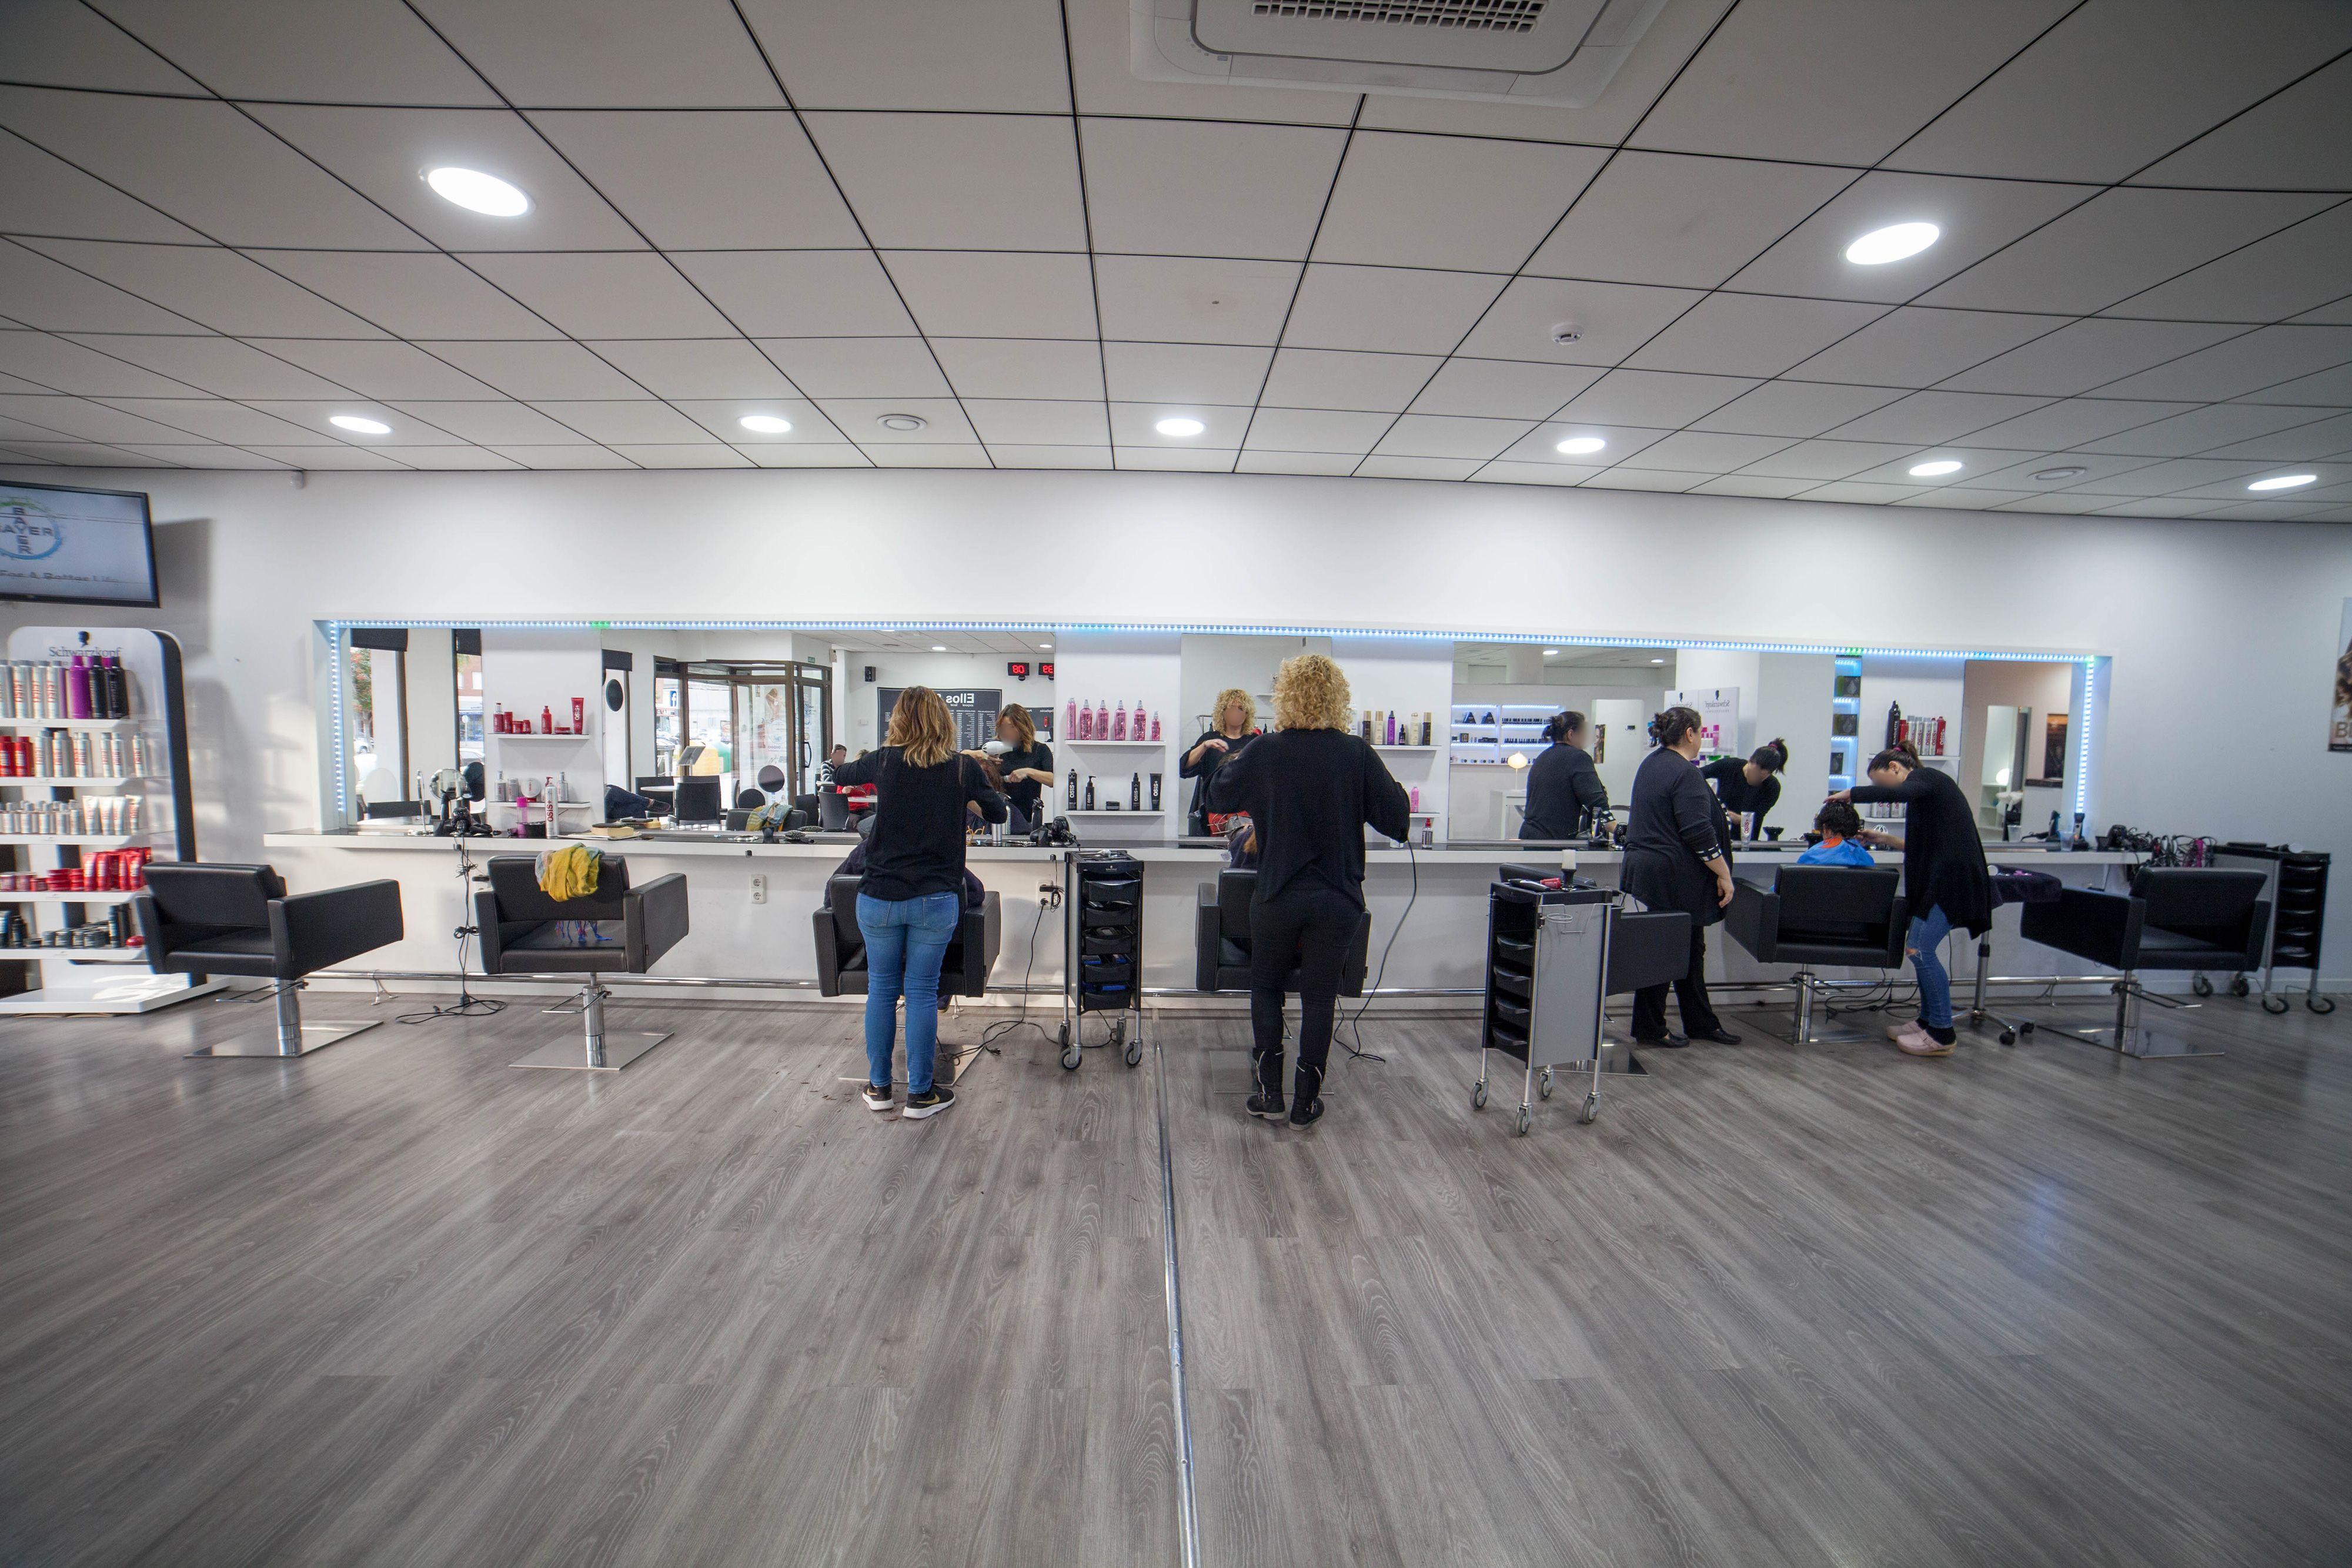 Centro de peluquería unisex en Almería